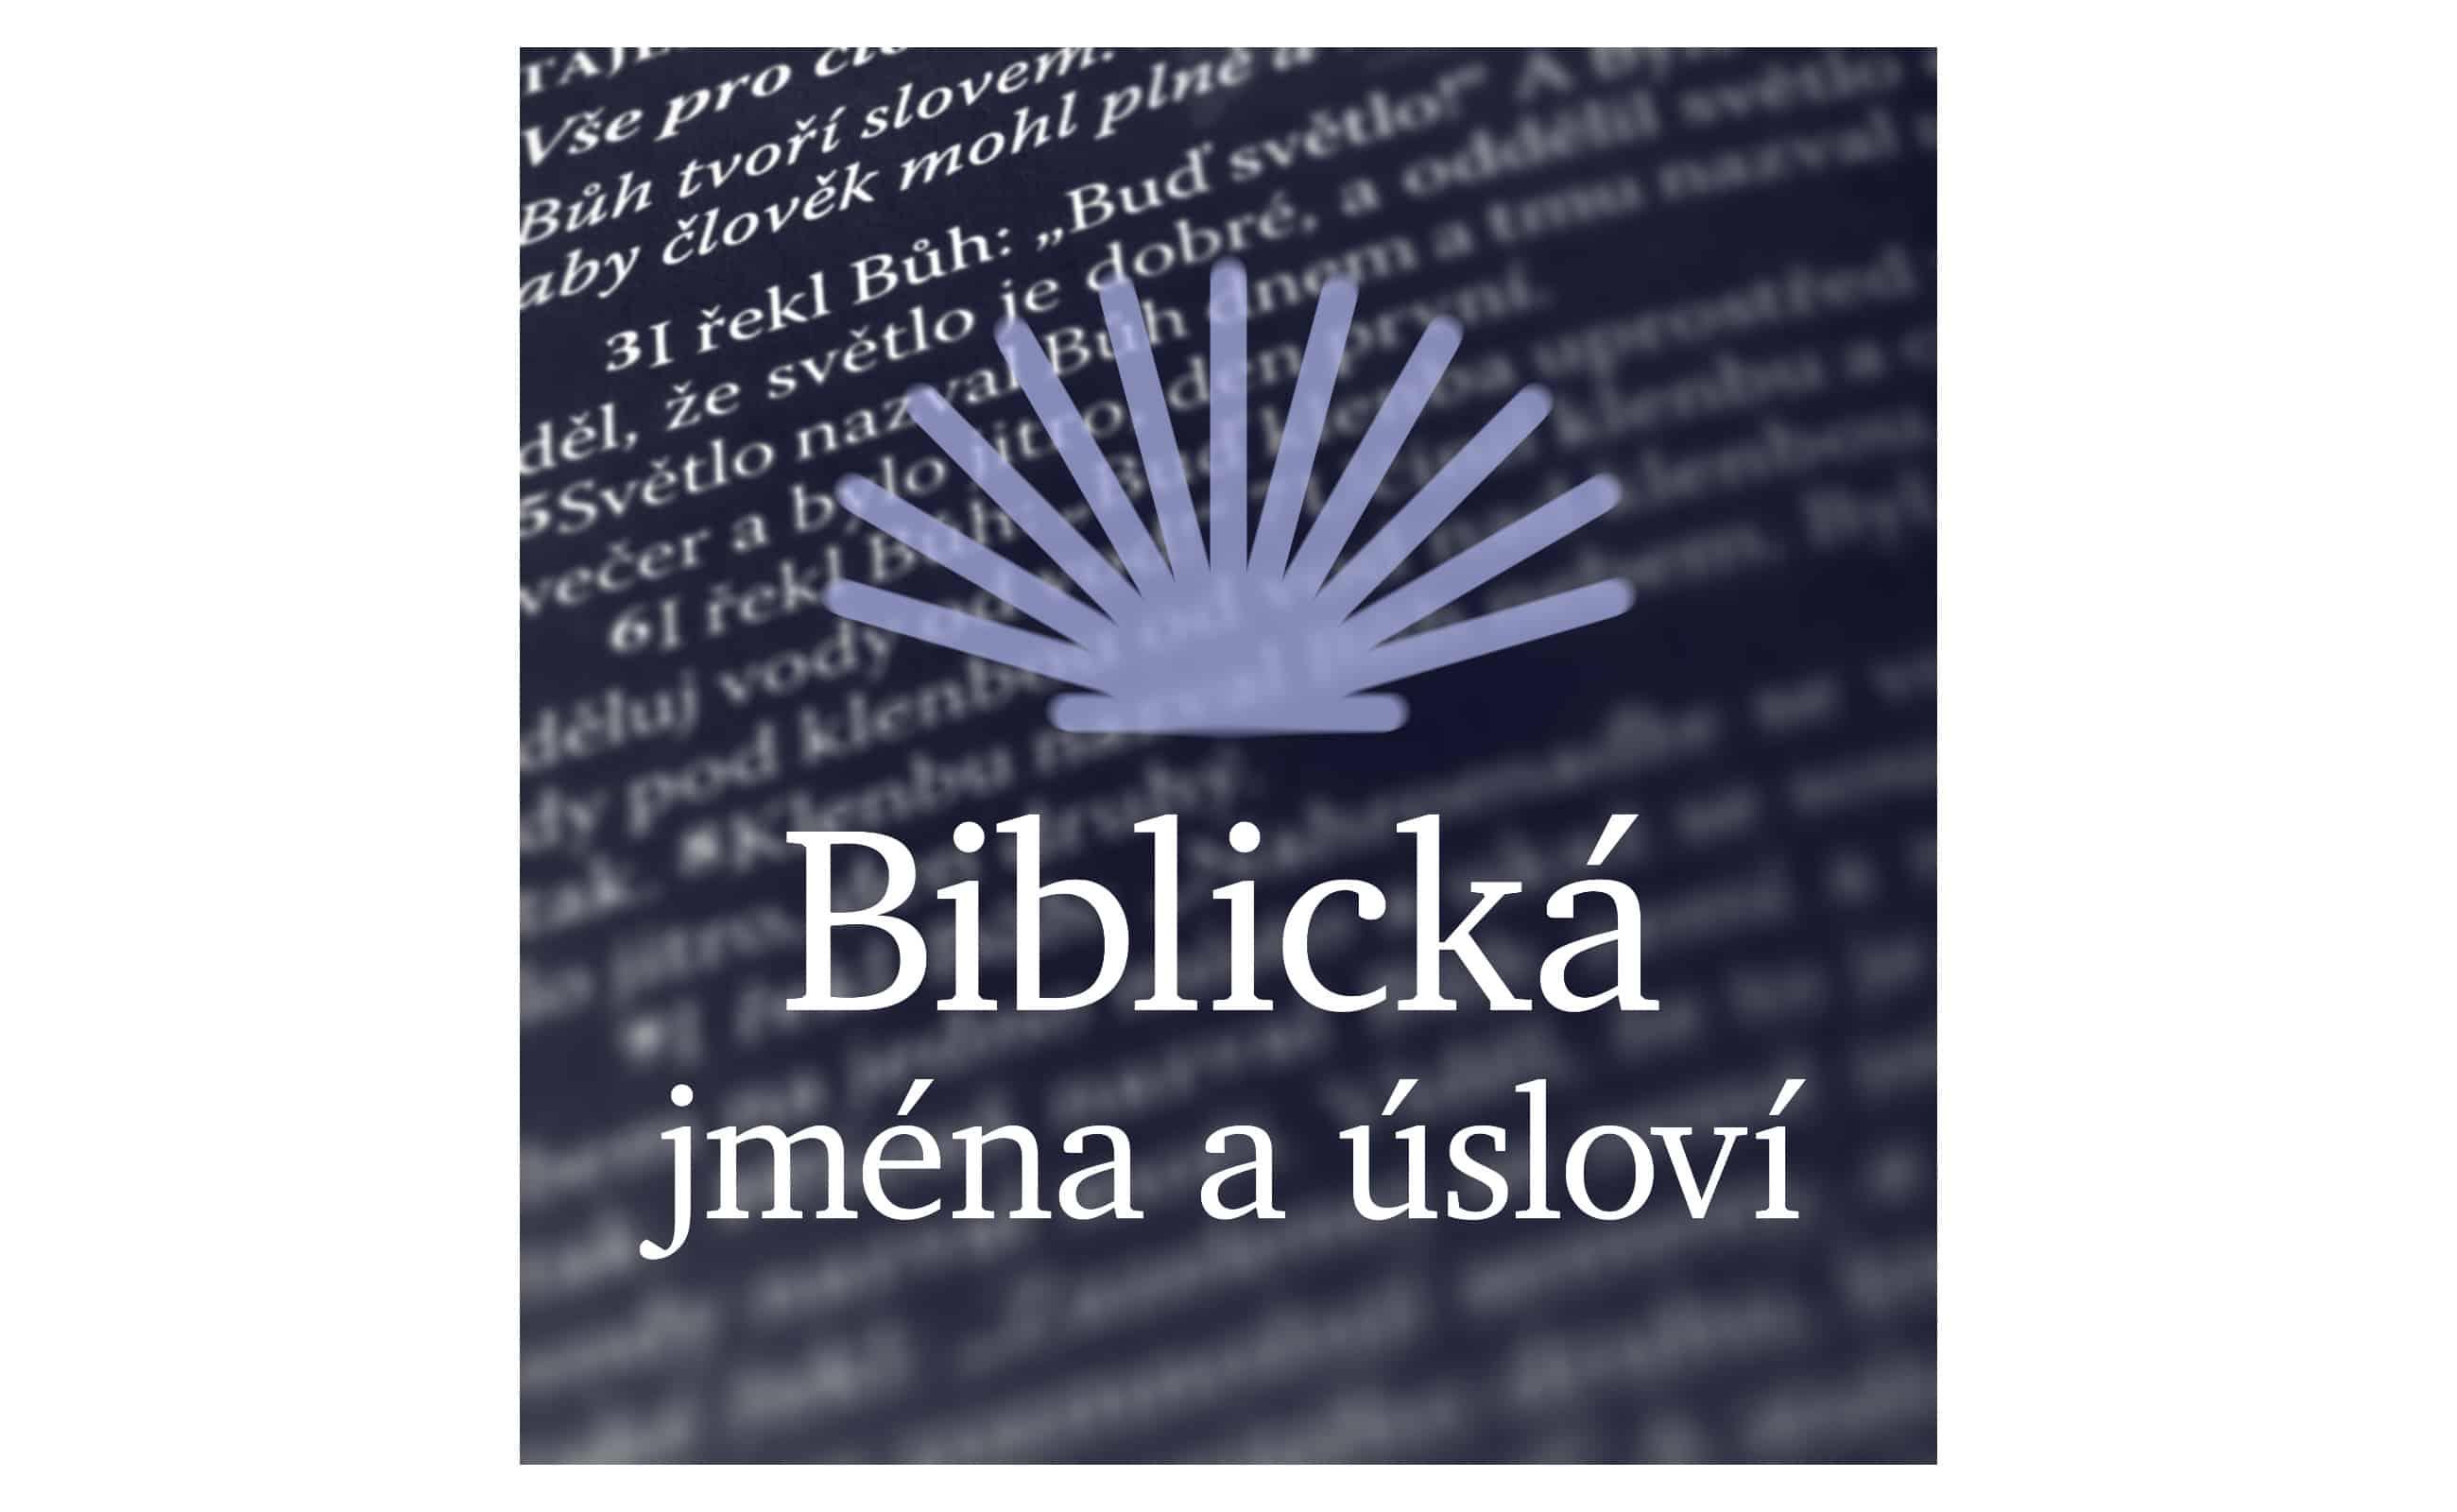 Biblismy.cz